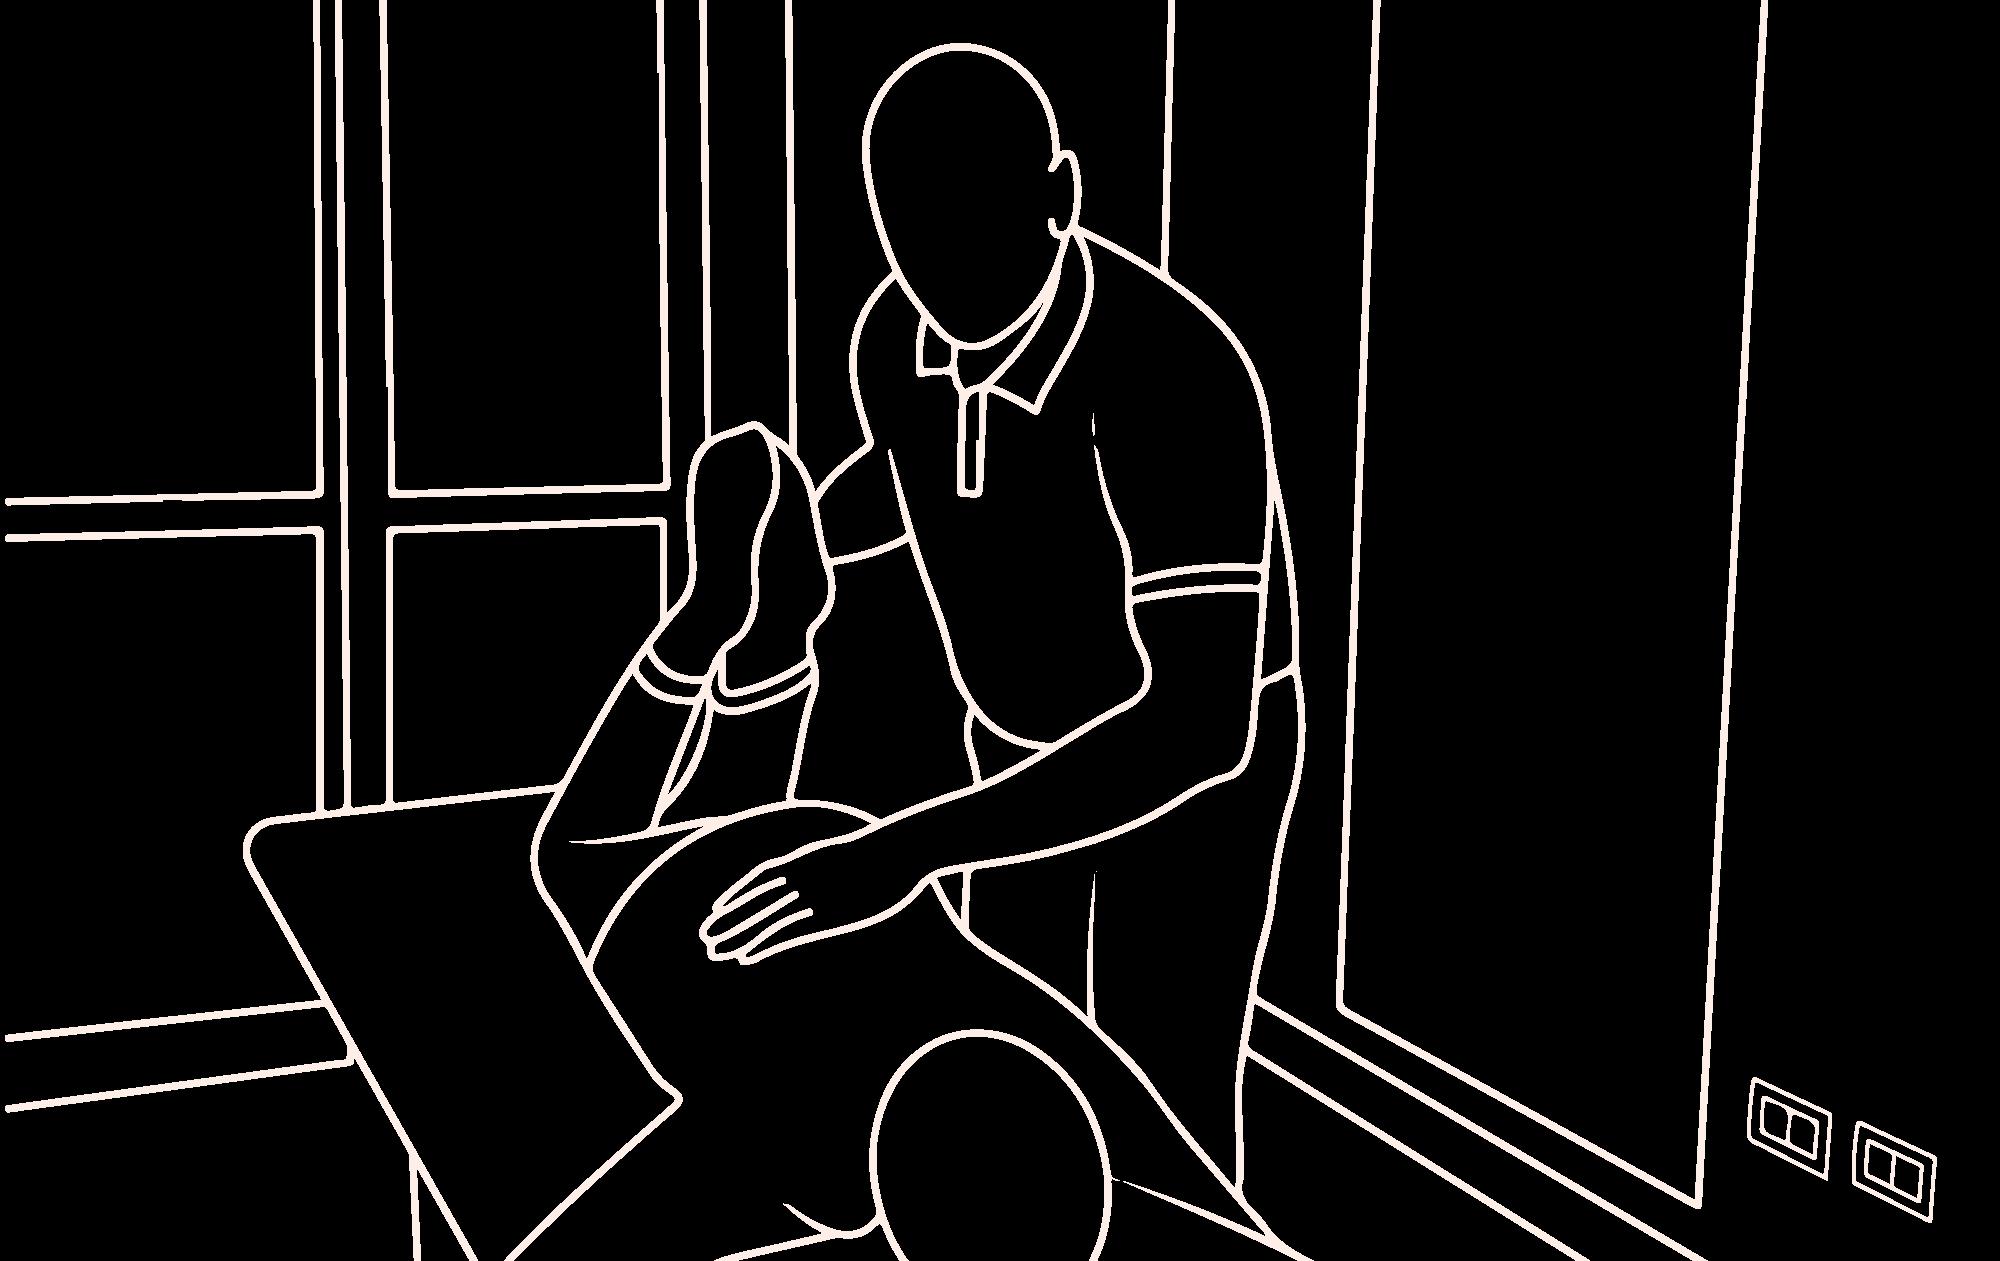 Patrick Murugan seduta chiropratica